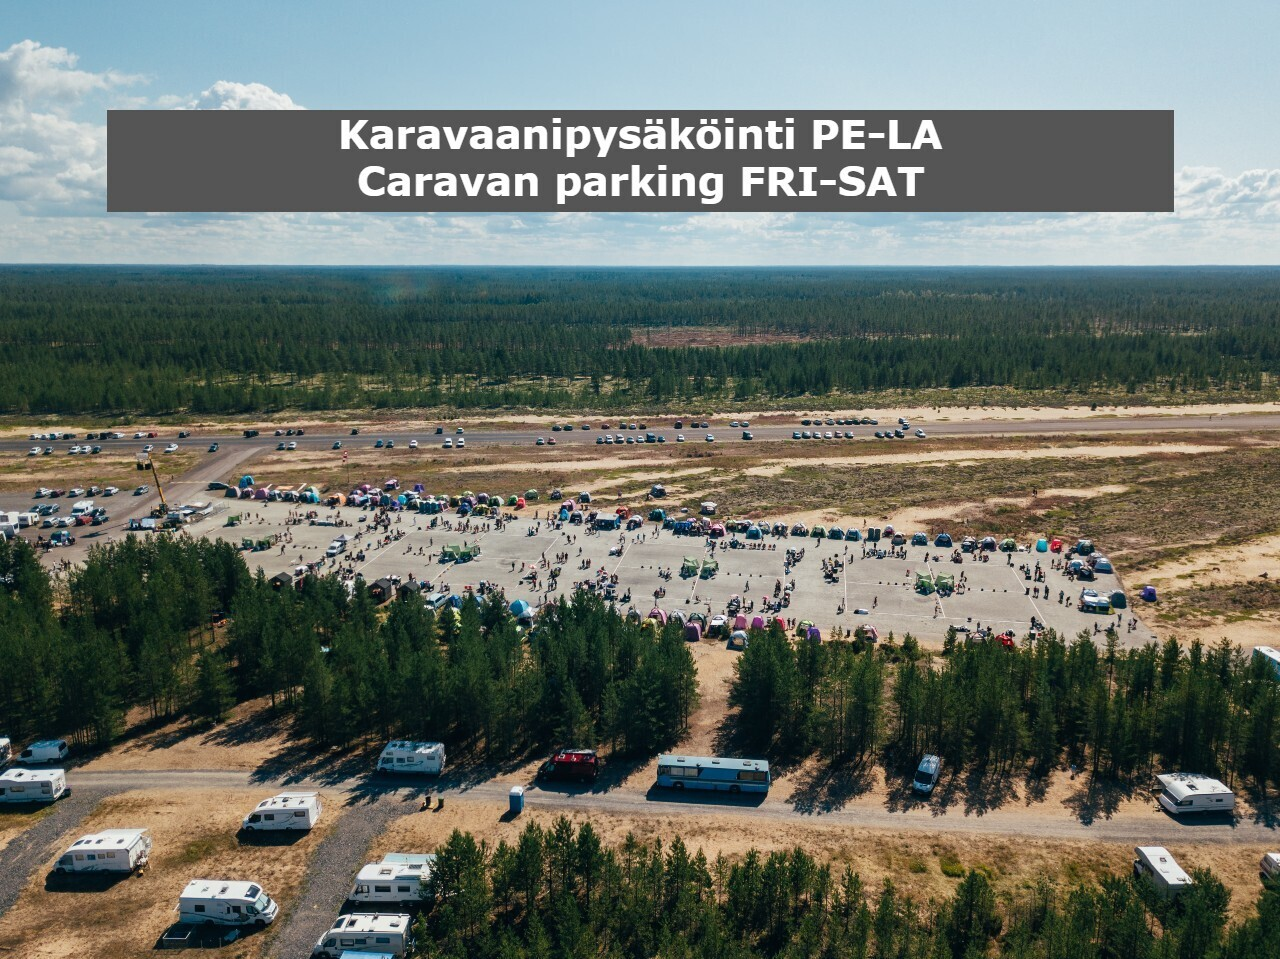 Karavaanipaikoitus pe-la / Caravan parking Fri-Sat